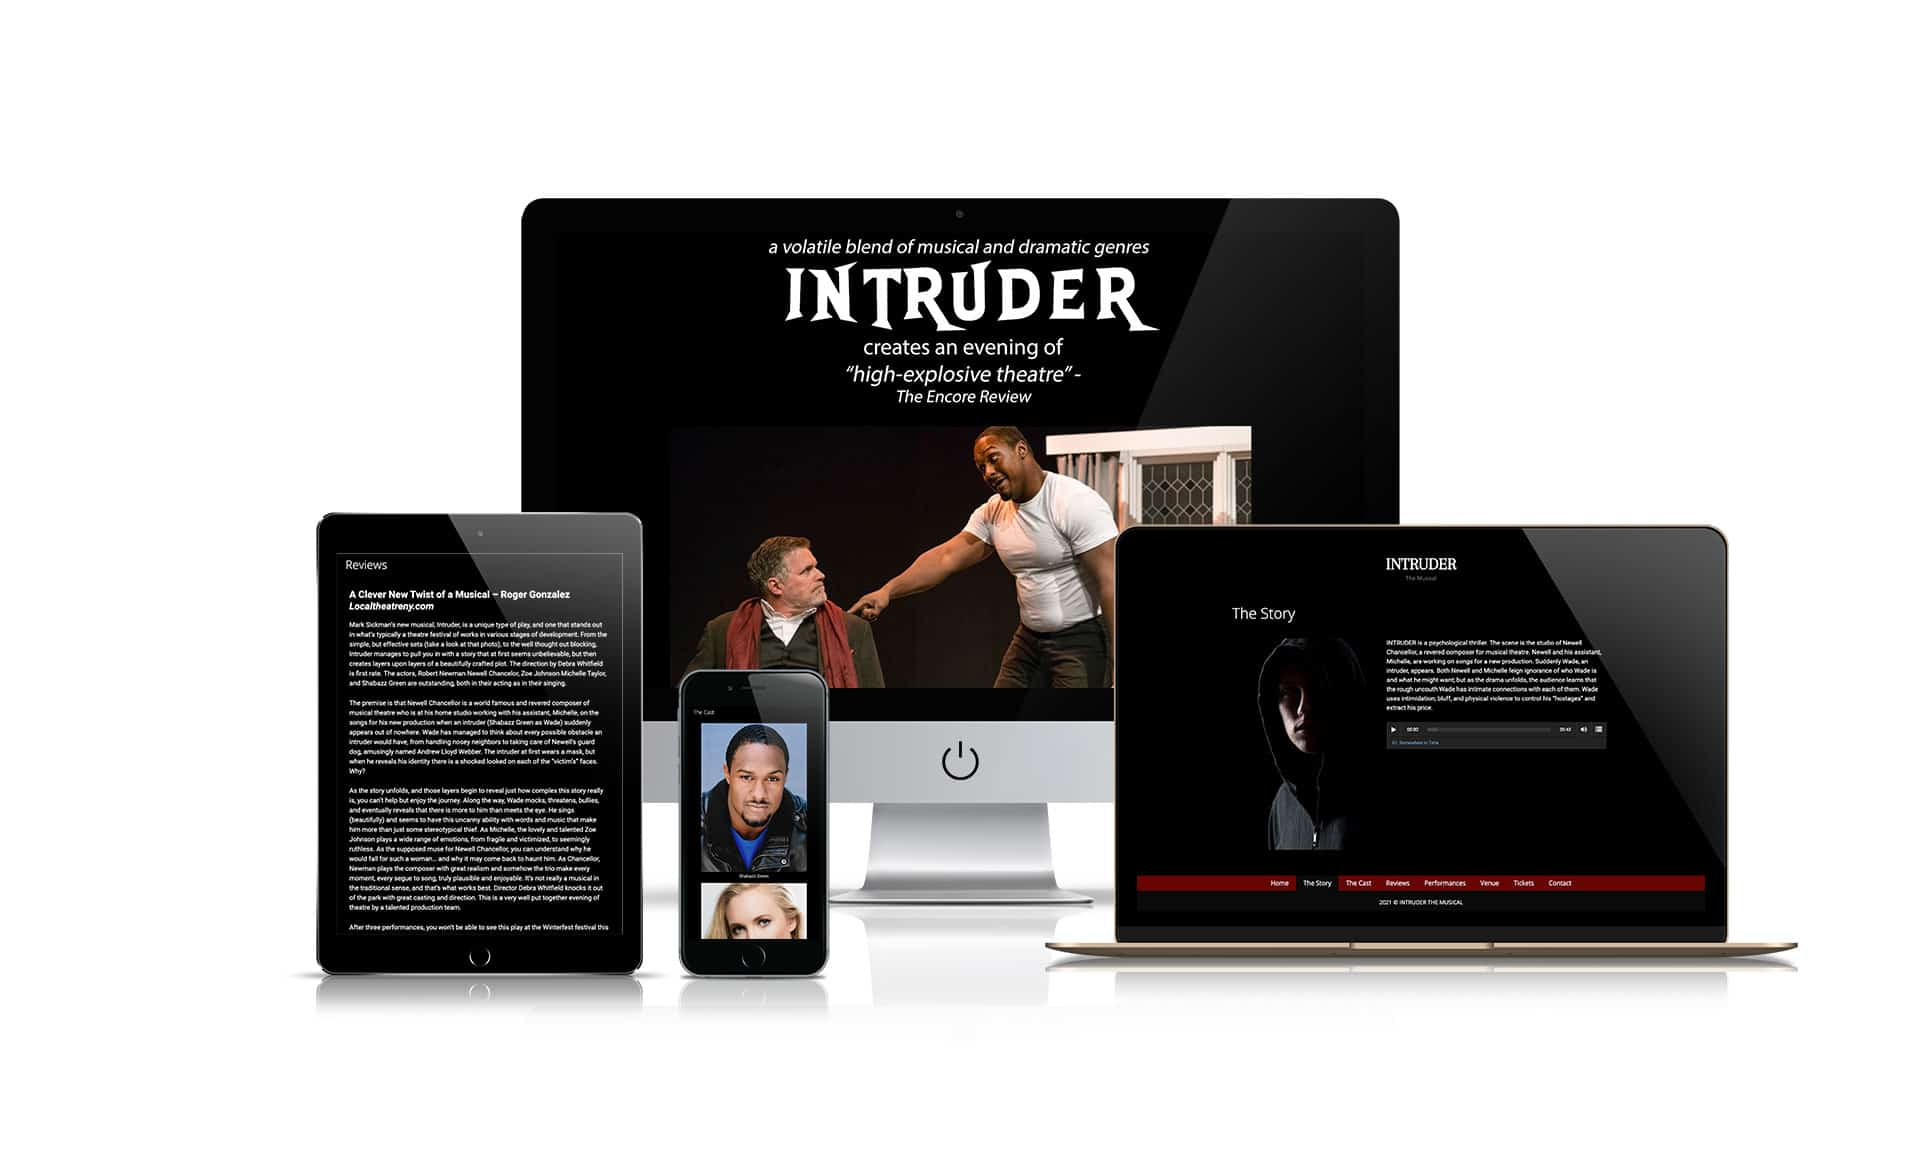 Intruder The Musical - Website Design